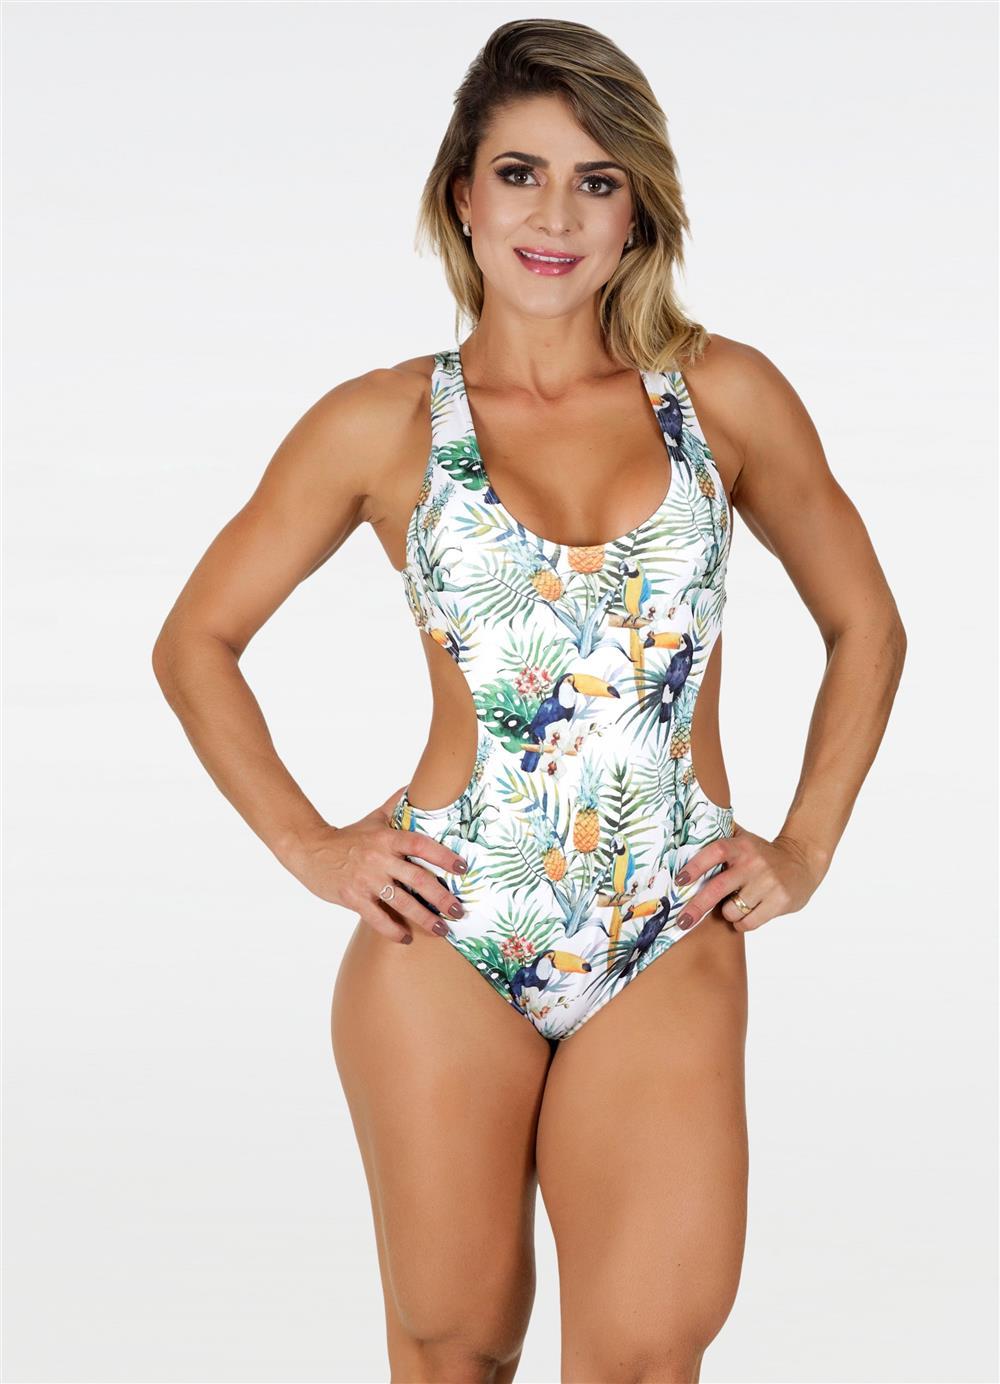 Body Jenifer Abacaxi Branco  - Fribasex - Fabricasex.com